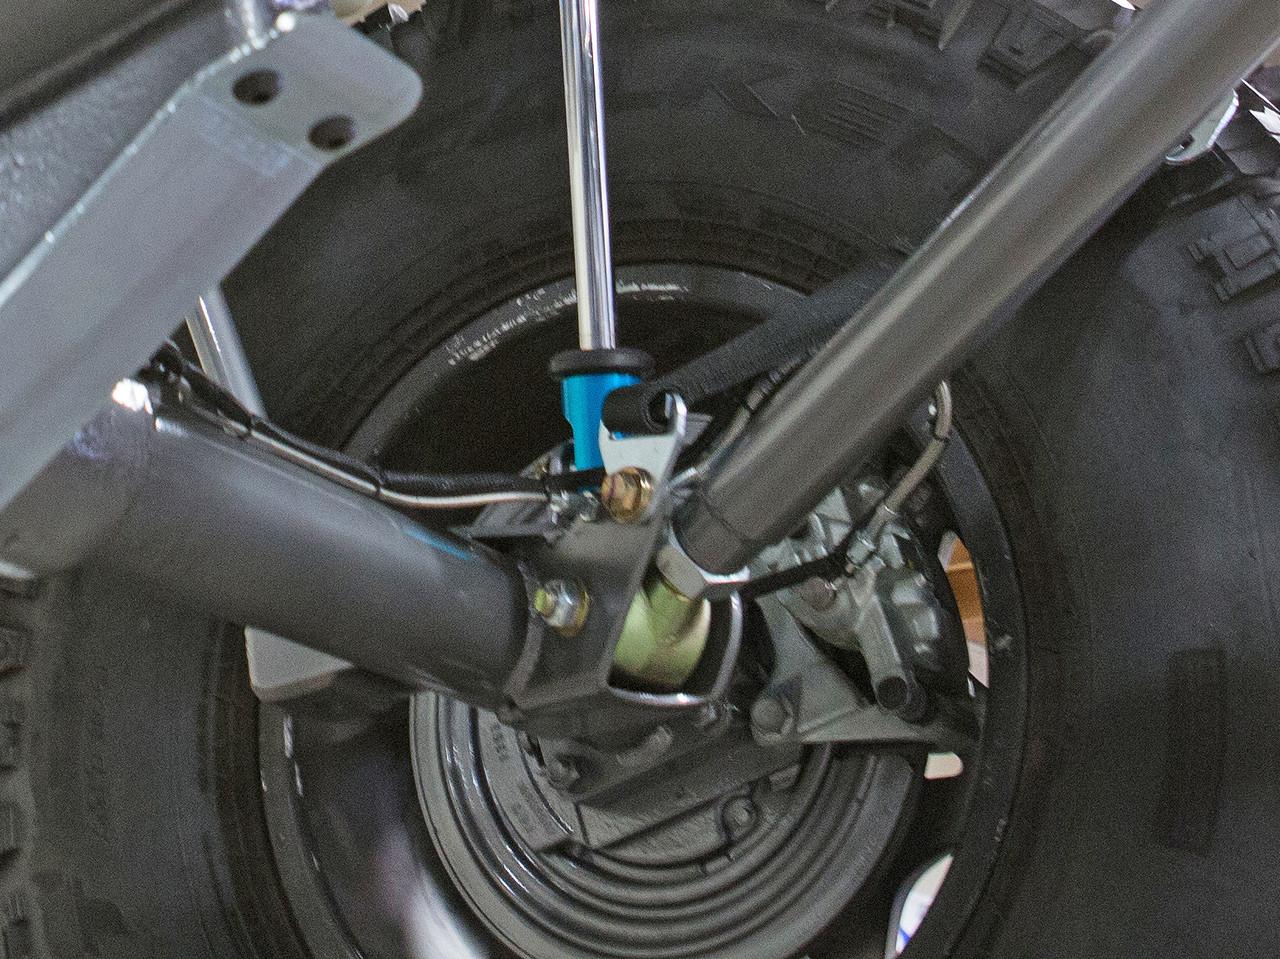 JK Elite Rear axle lower link, shock, and limit strap mount